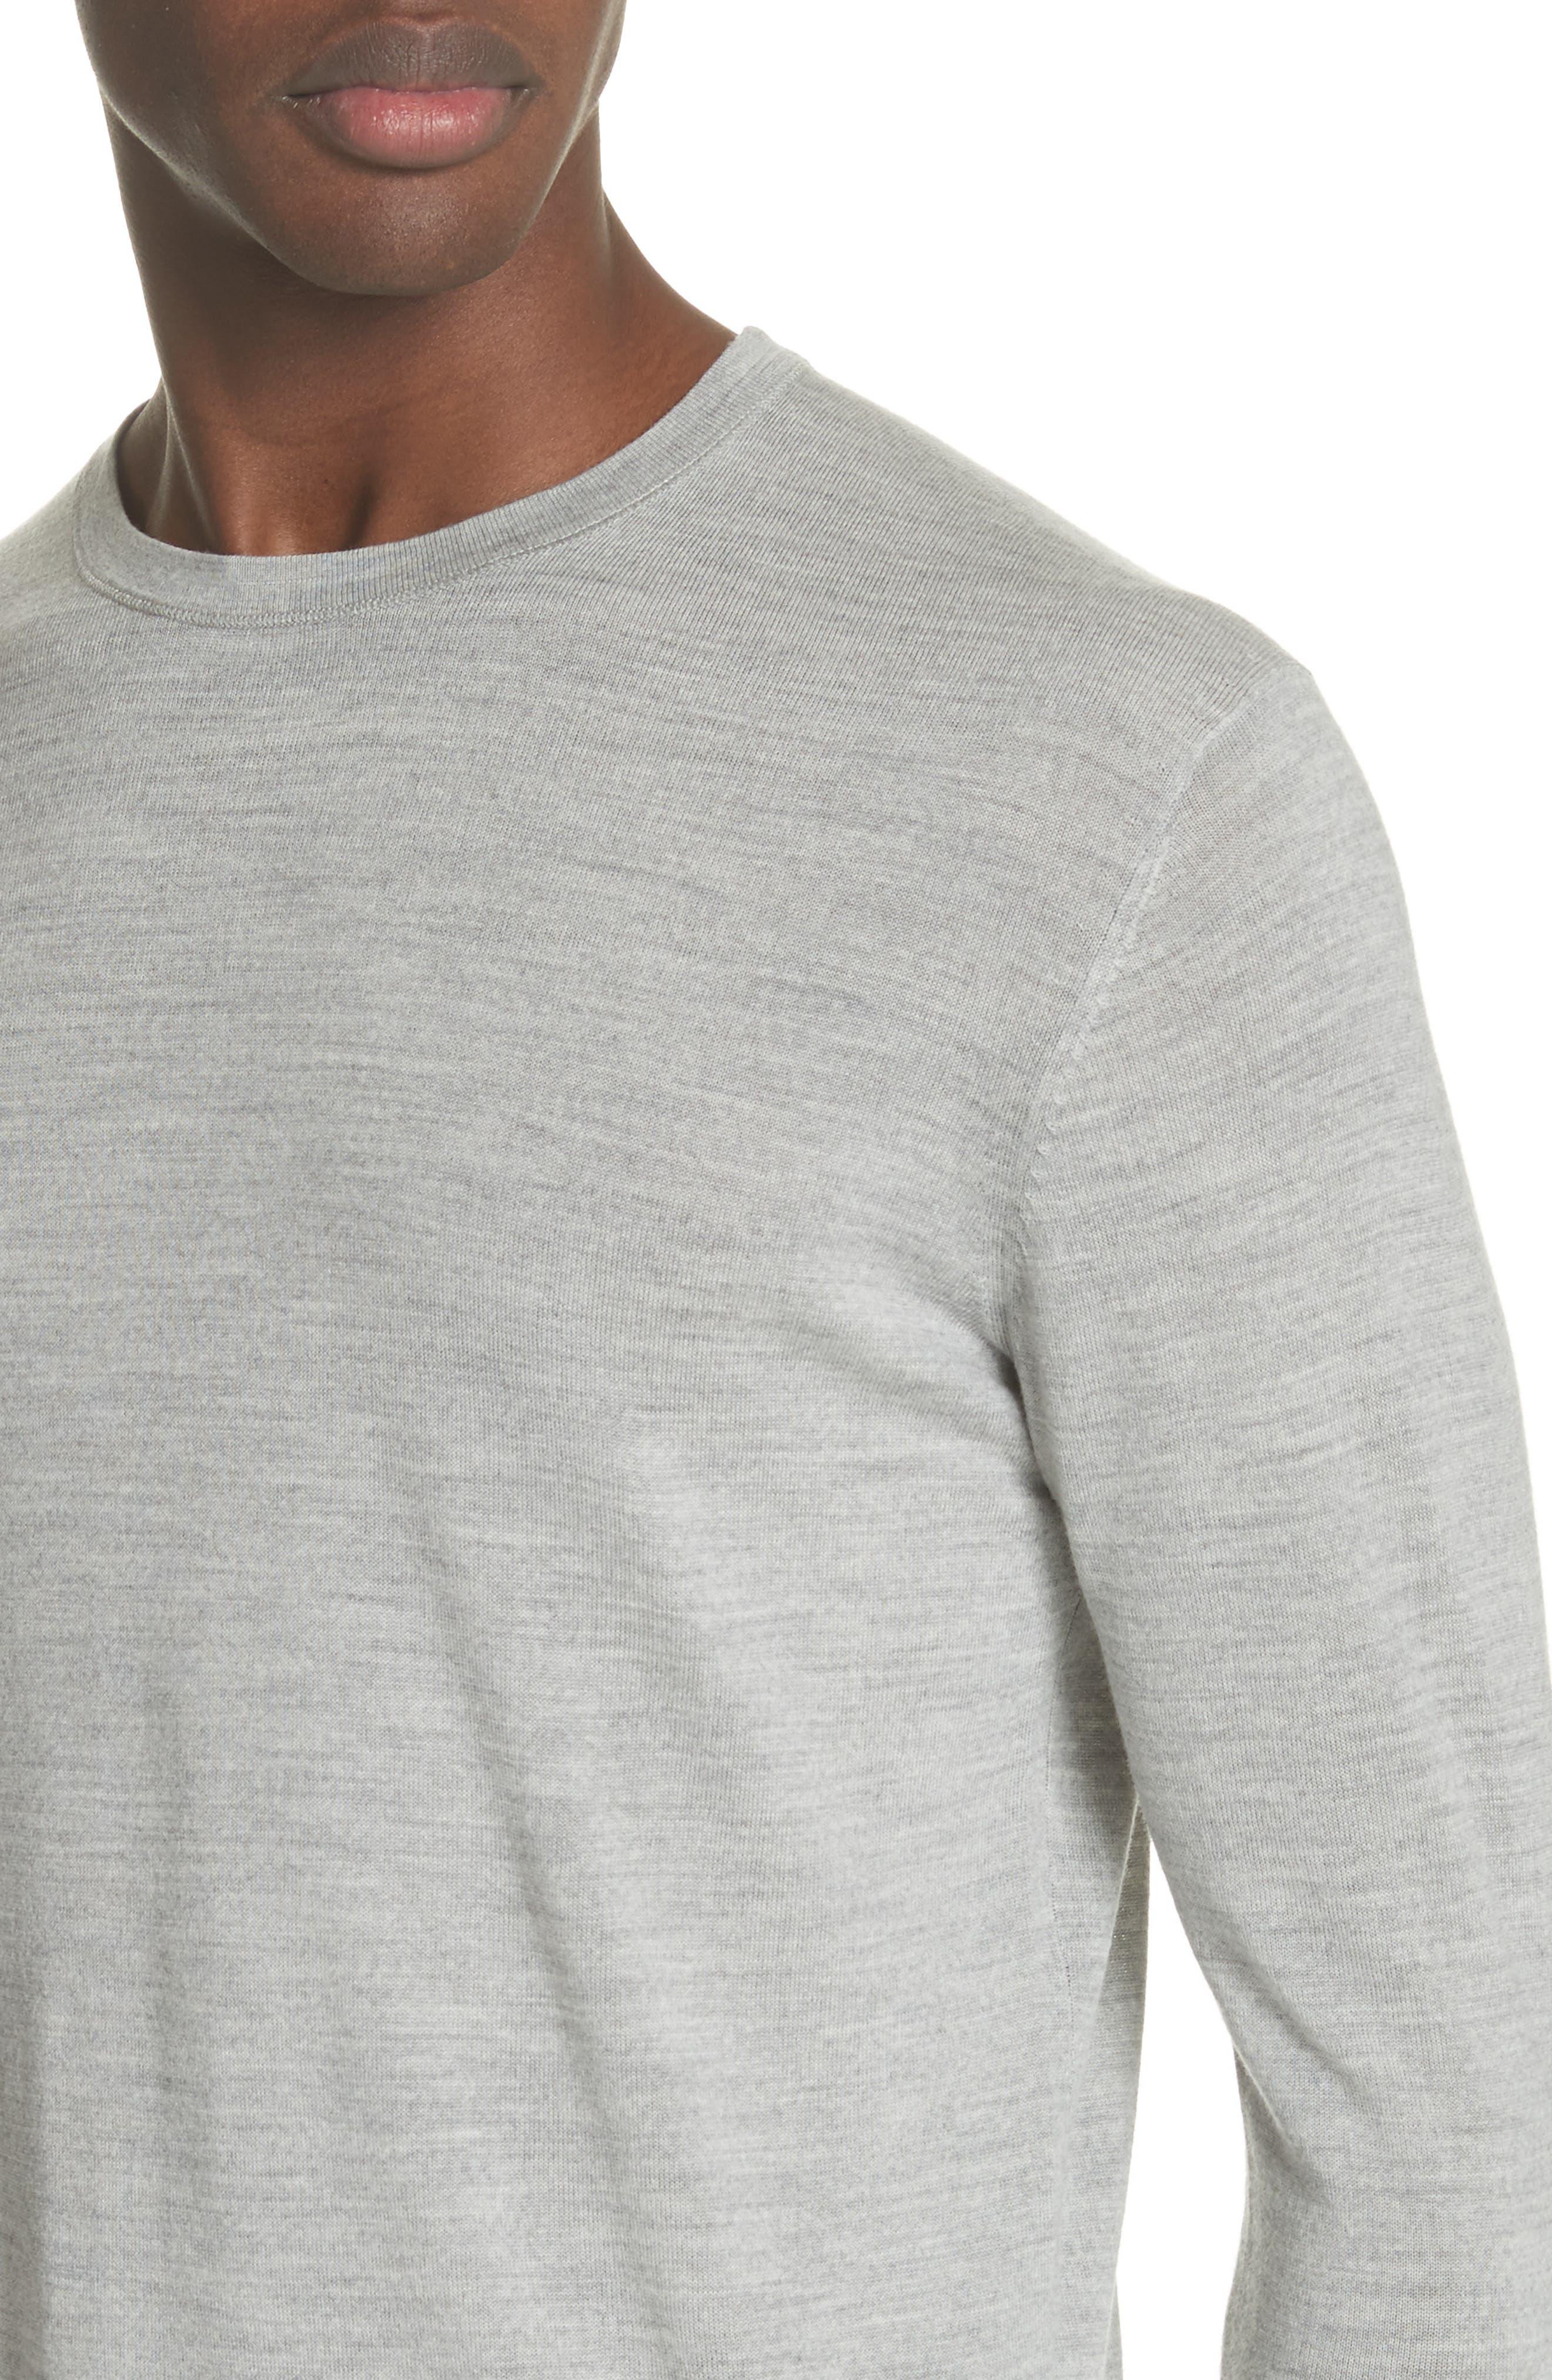 Nino Crewneck Wool Sweater,                             Alternate thumbnail 4, color,                             020